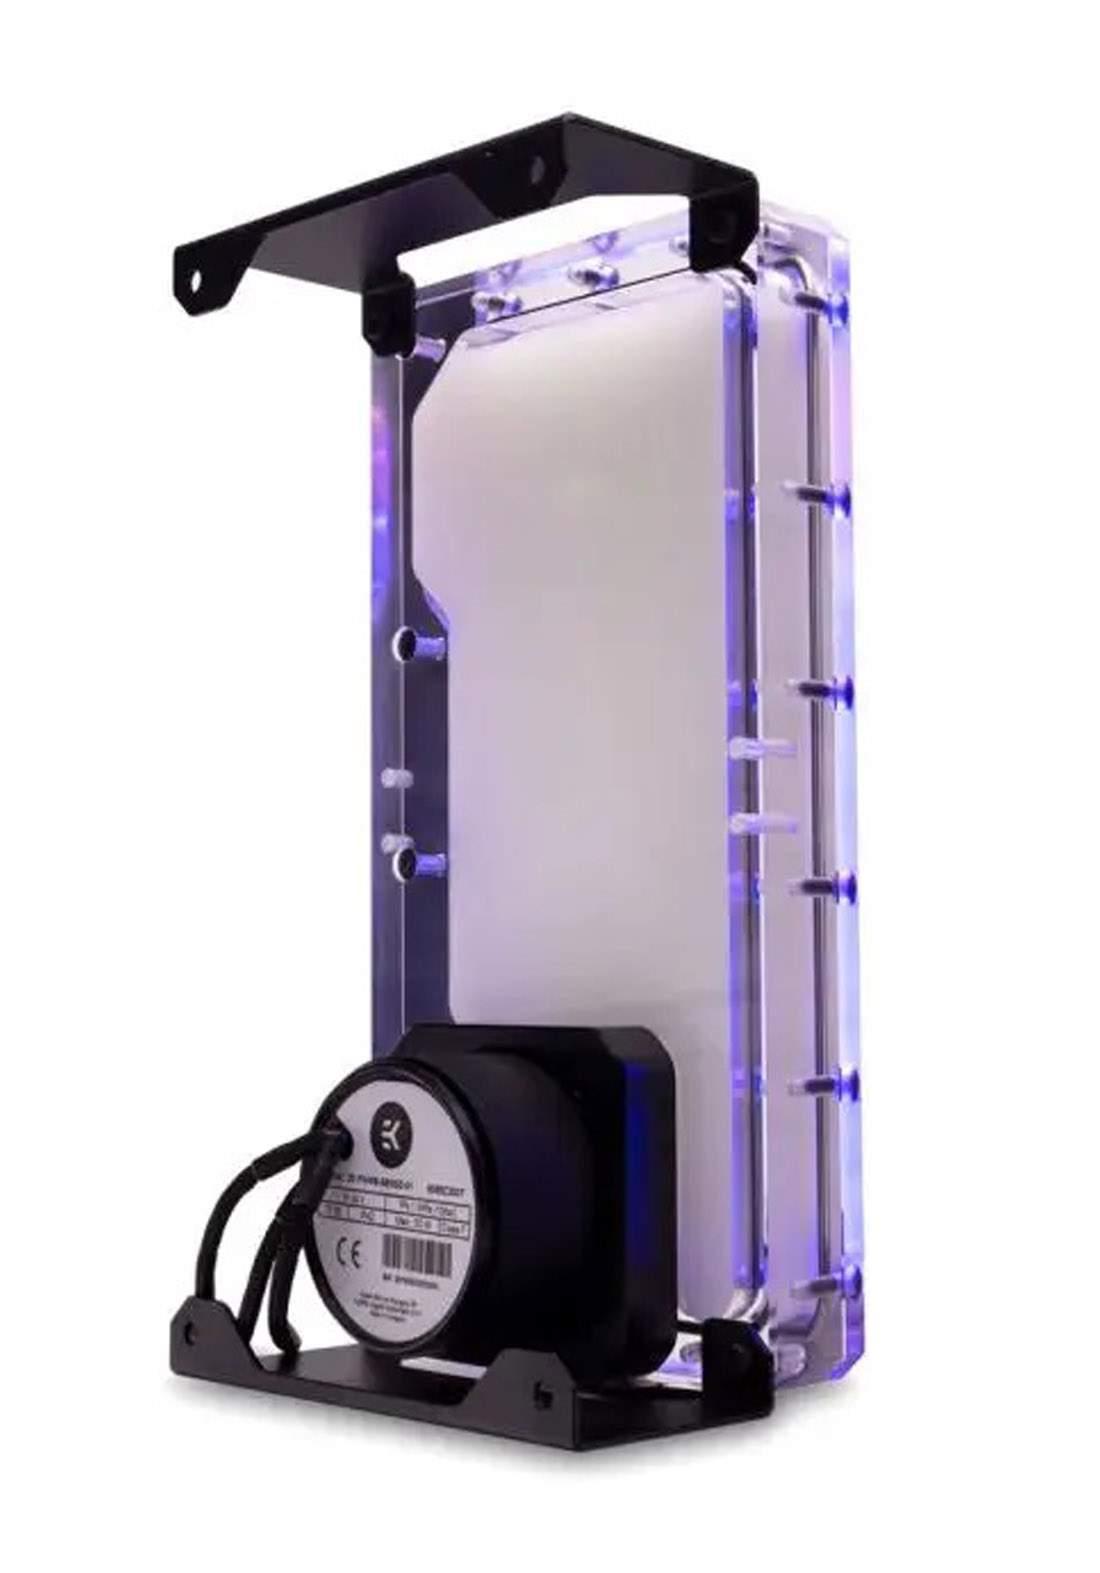 EK Quantum Kinetic FLT 360 Body D-RGB  Plexi